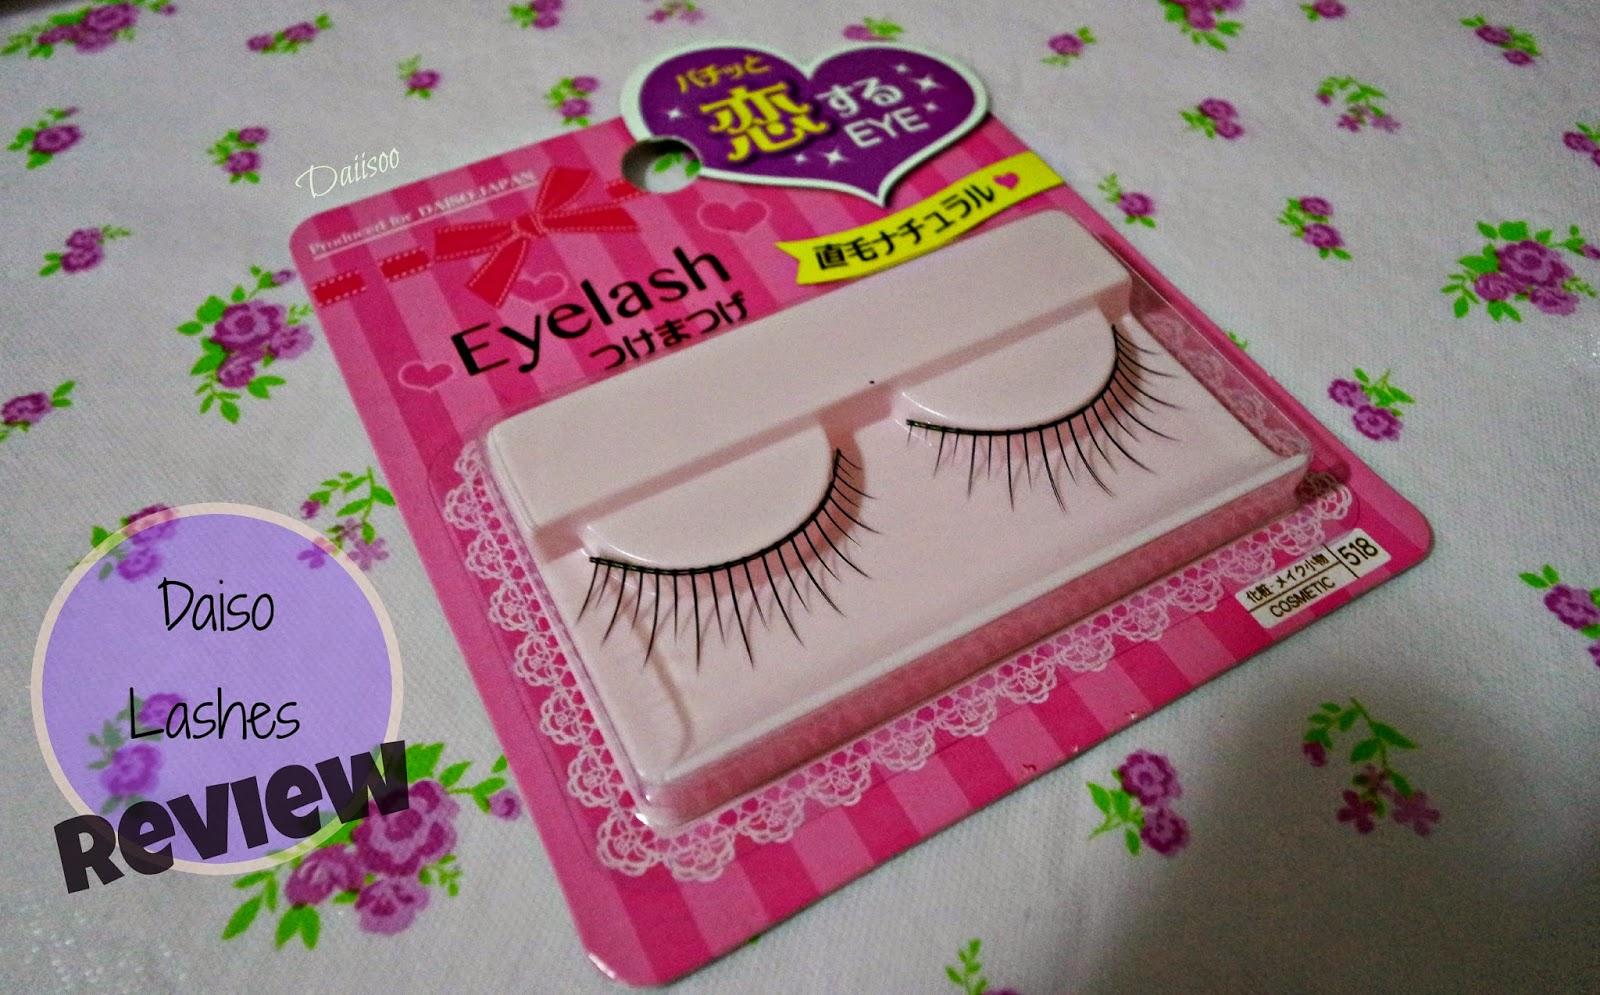 833605fceeb Daiisoo: [Review]: Daiso False Eyelashes